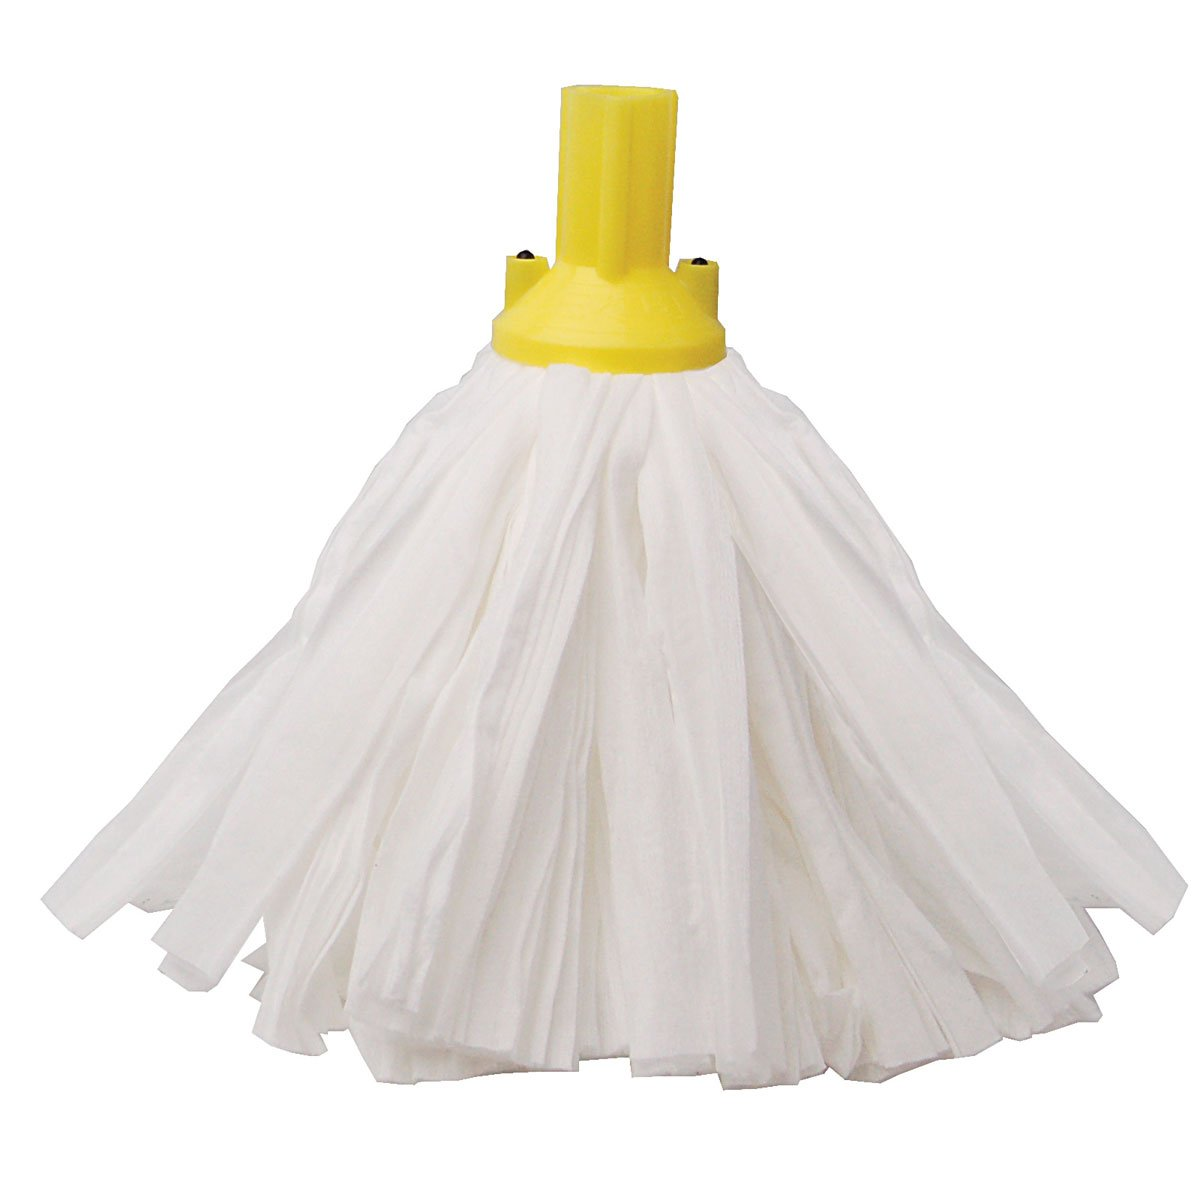 Exel Y24 Big White Socket Mops Yellow Pack of 10